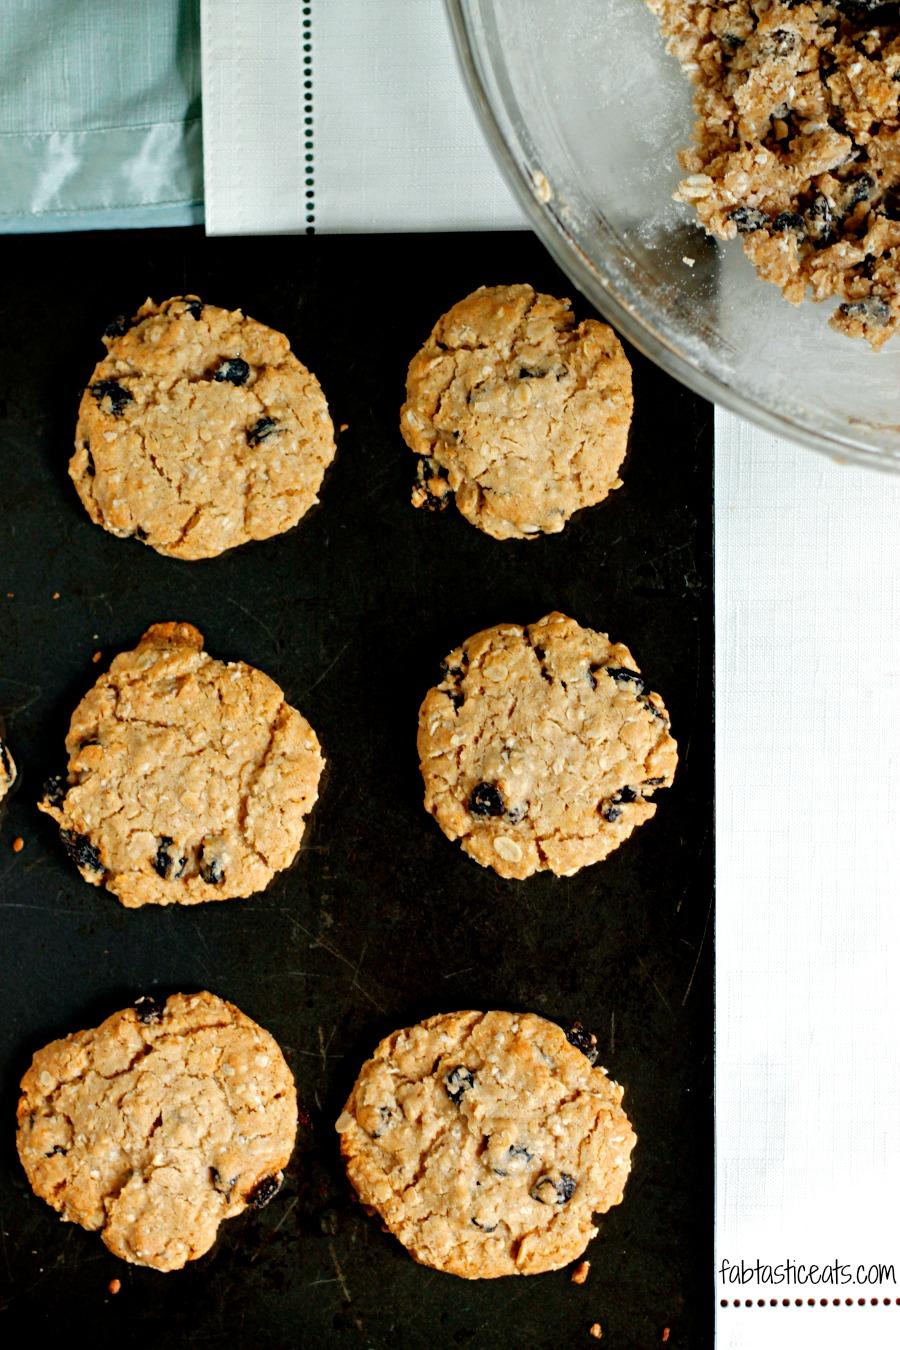 Crispy Oatmeal Raisin Cookies